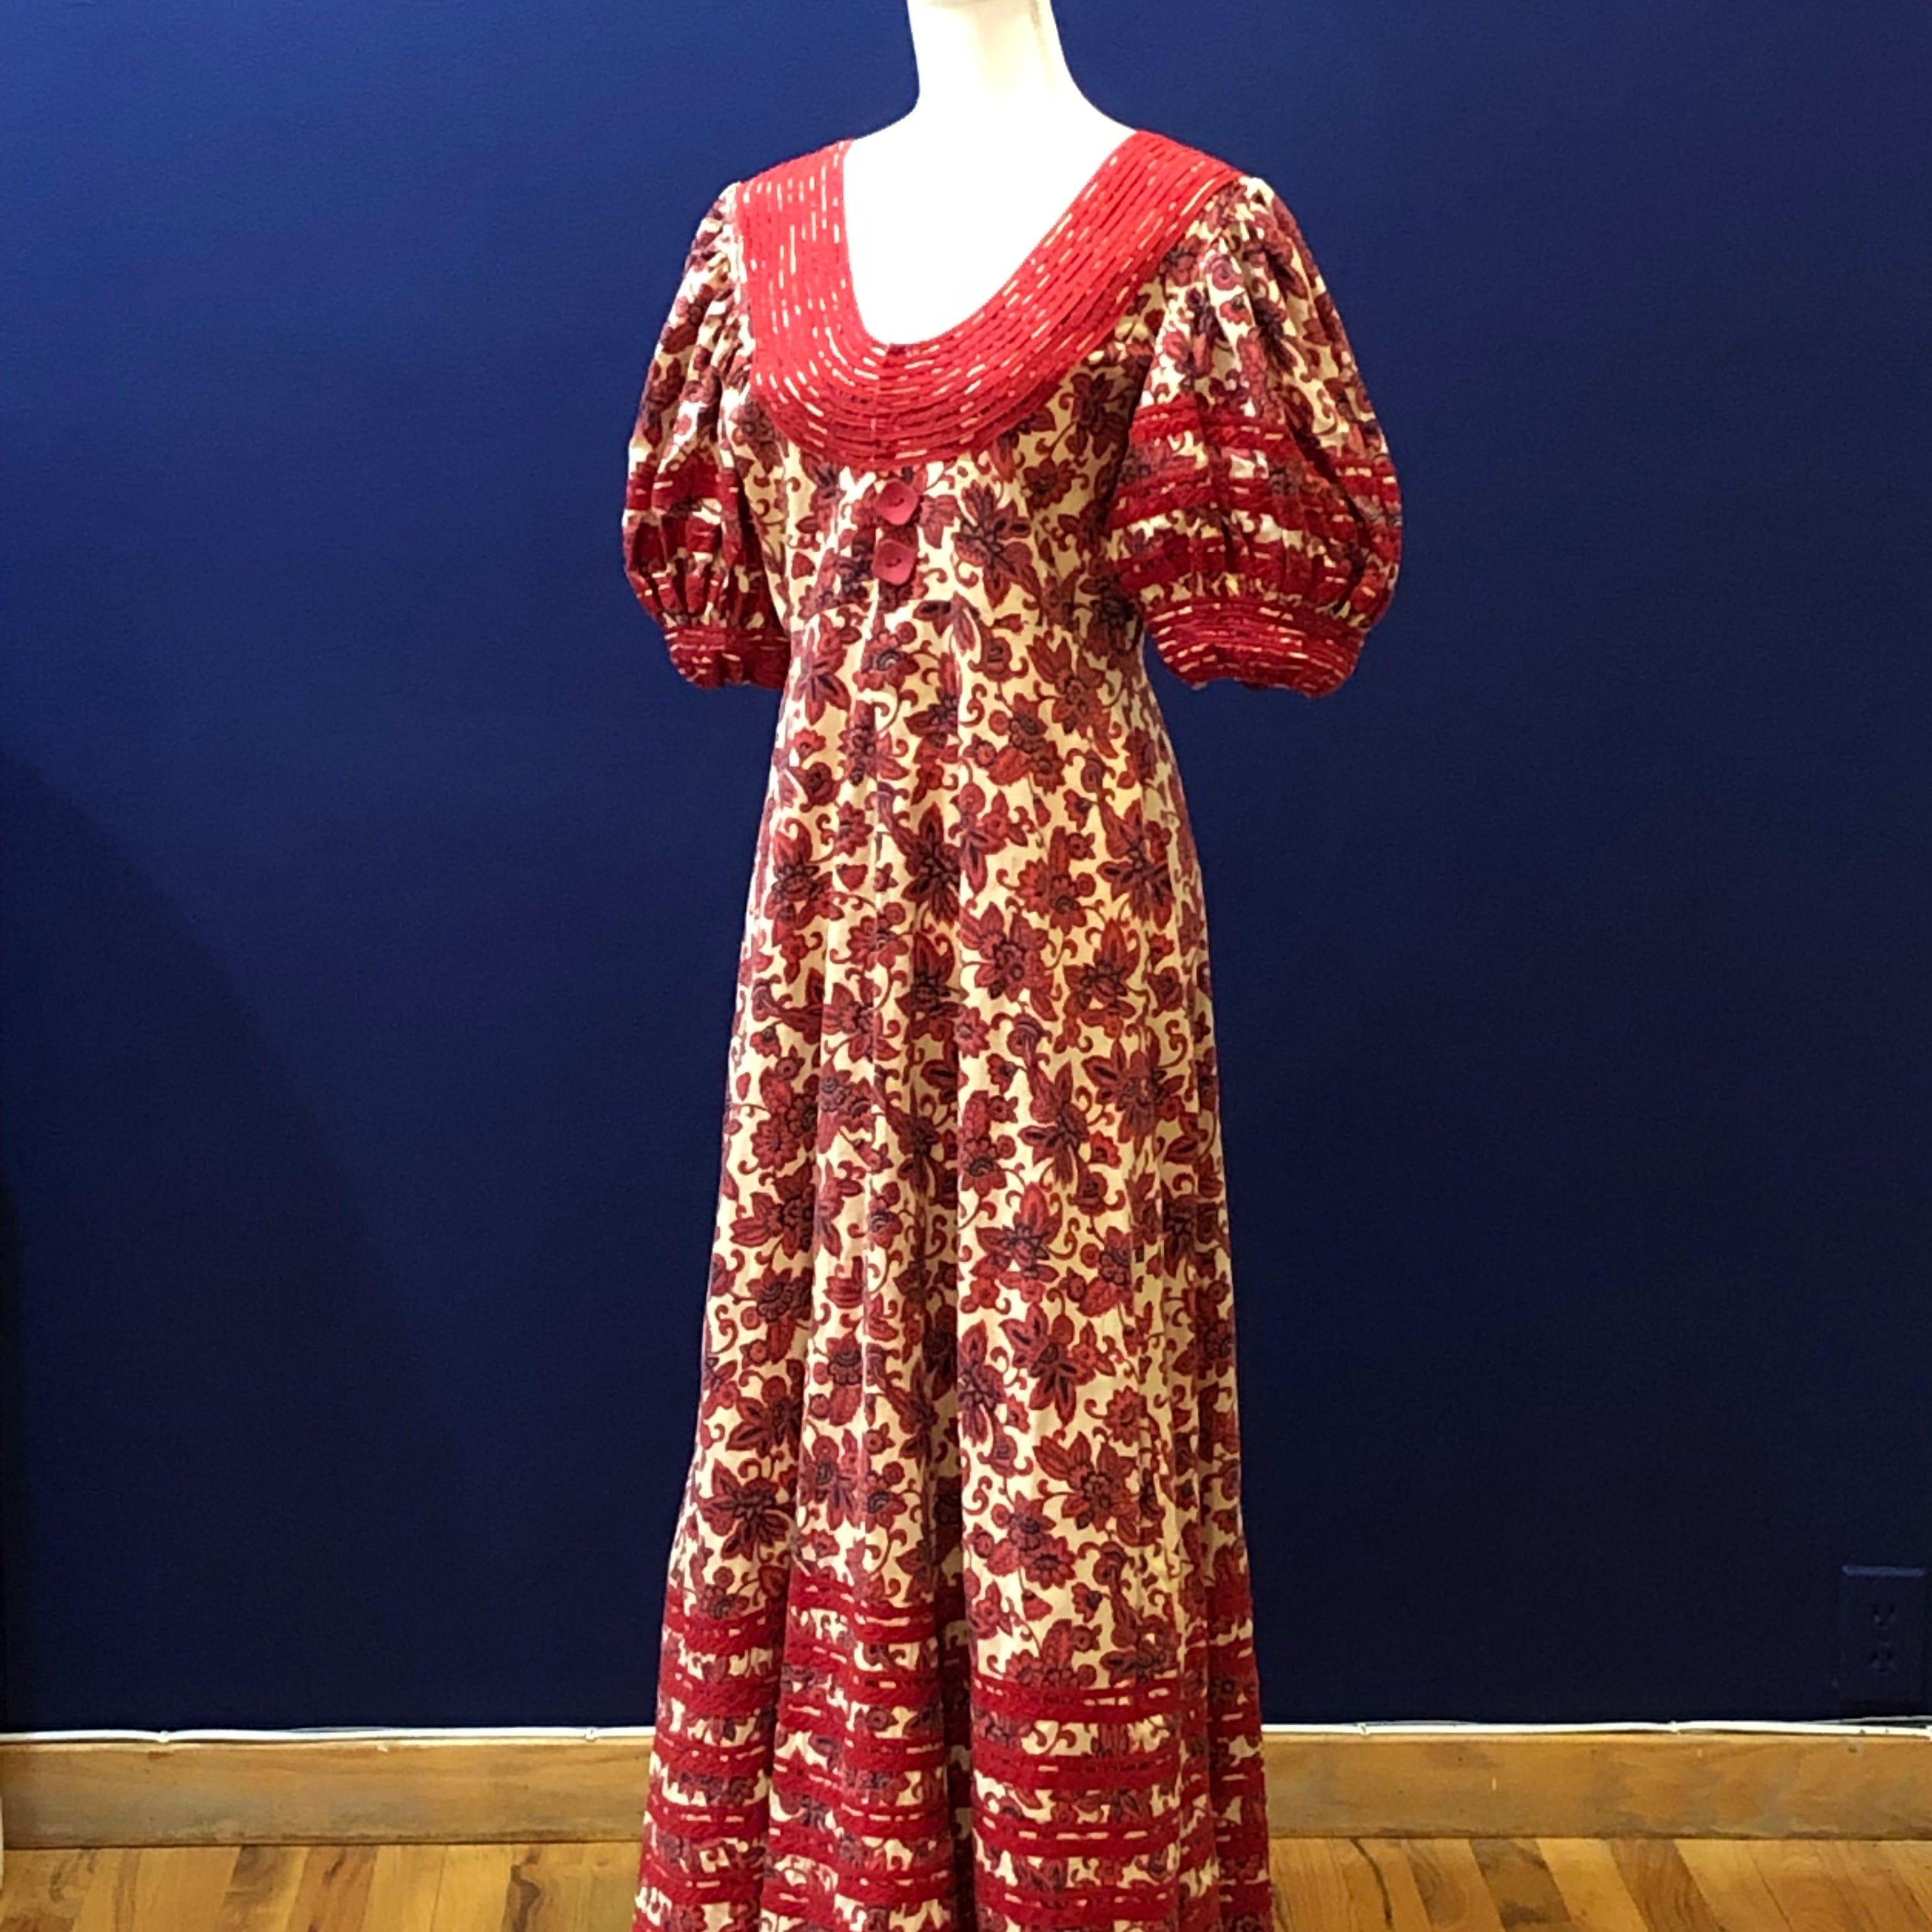 Woodstock exhibit unveils rarely seen items from arts colony era